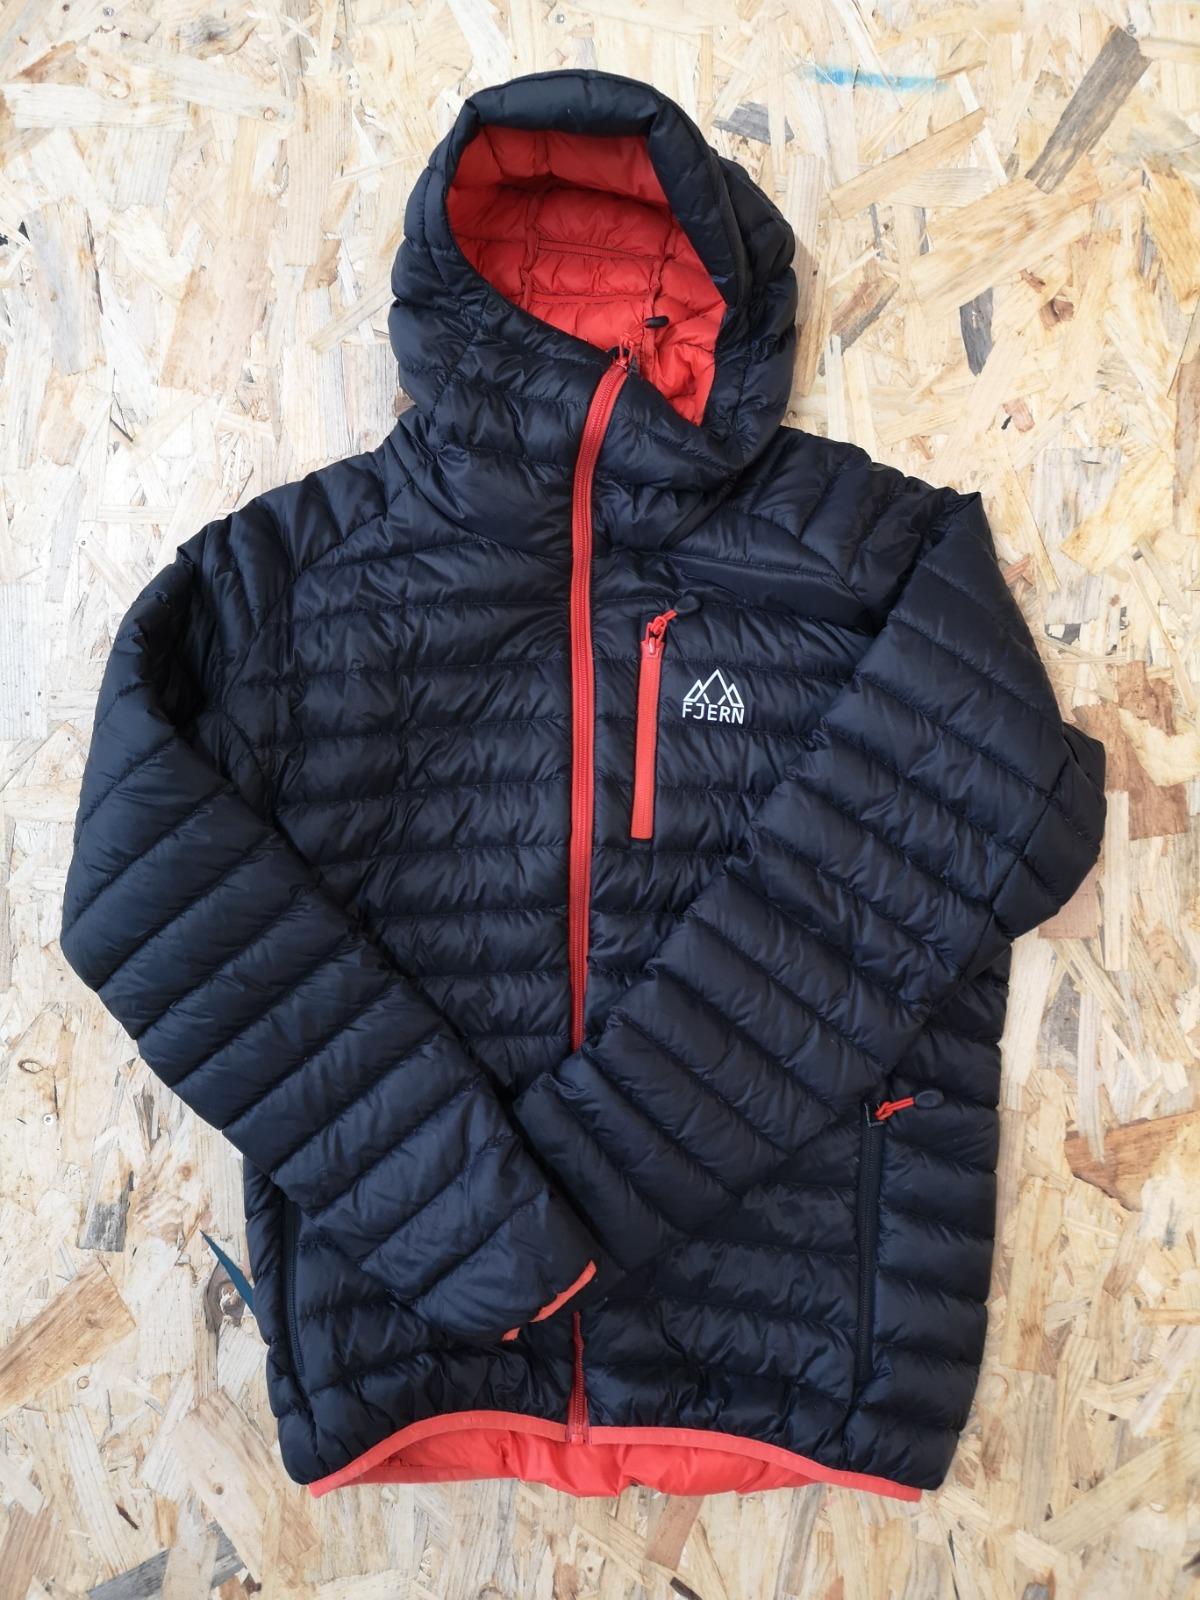 Fjern Down Jacket Black/Orange zips